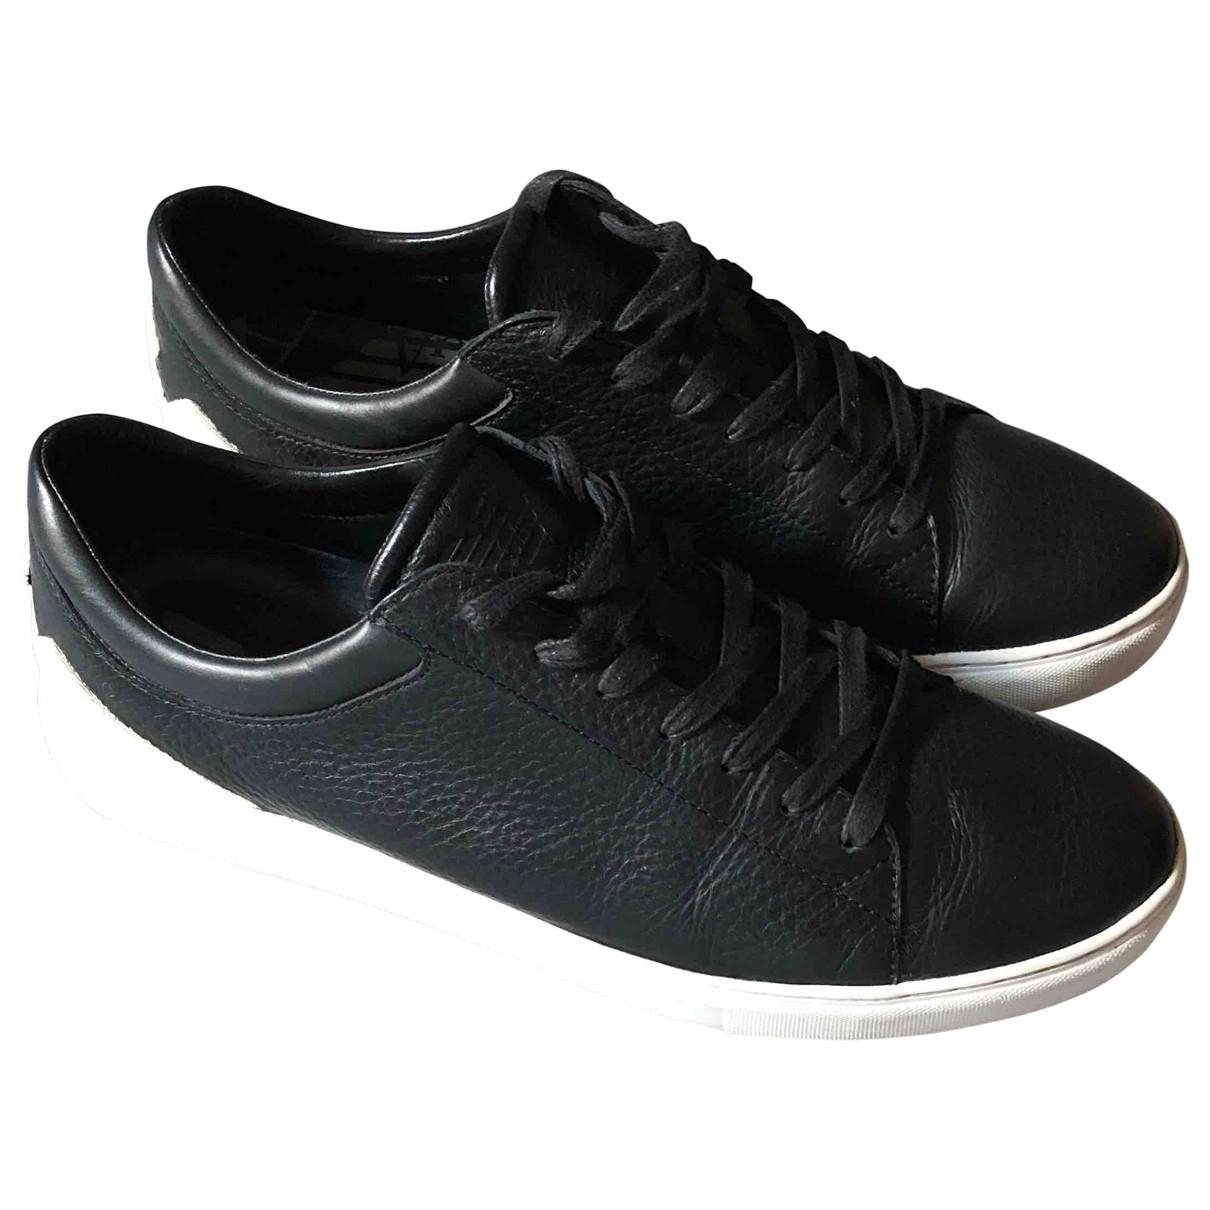 Emporio Armani \N Sneakers in  Schwarz Leder